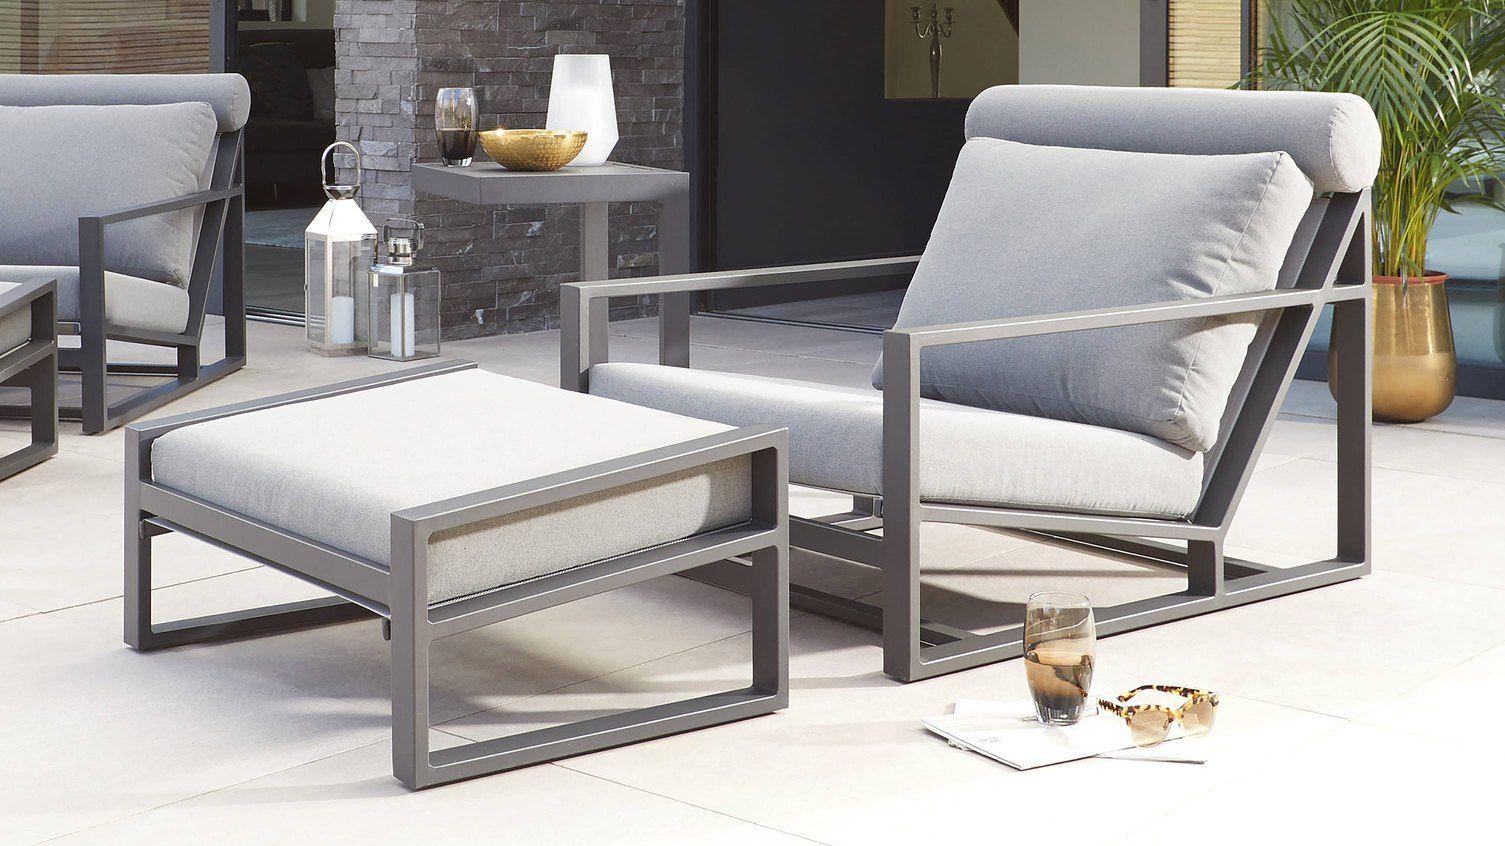 Verano Grey Garden Lounge Chair And Footstool Danetti Uk